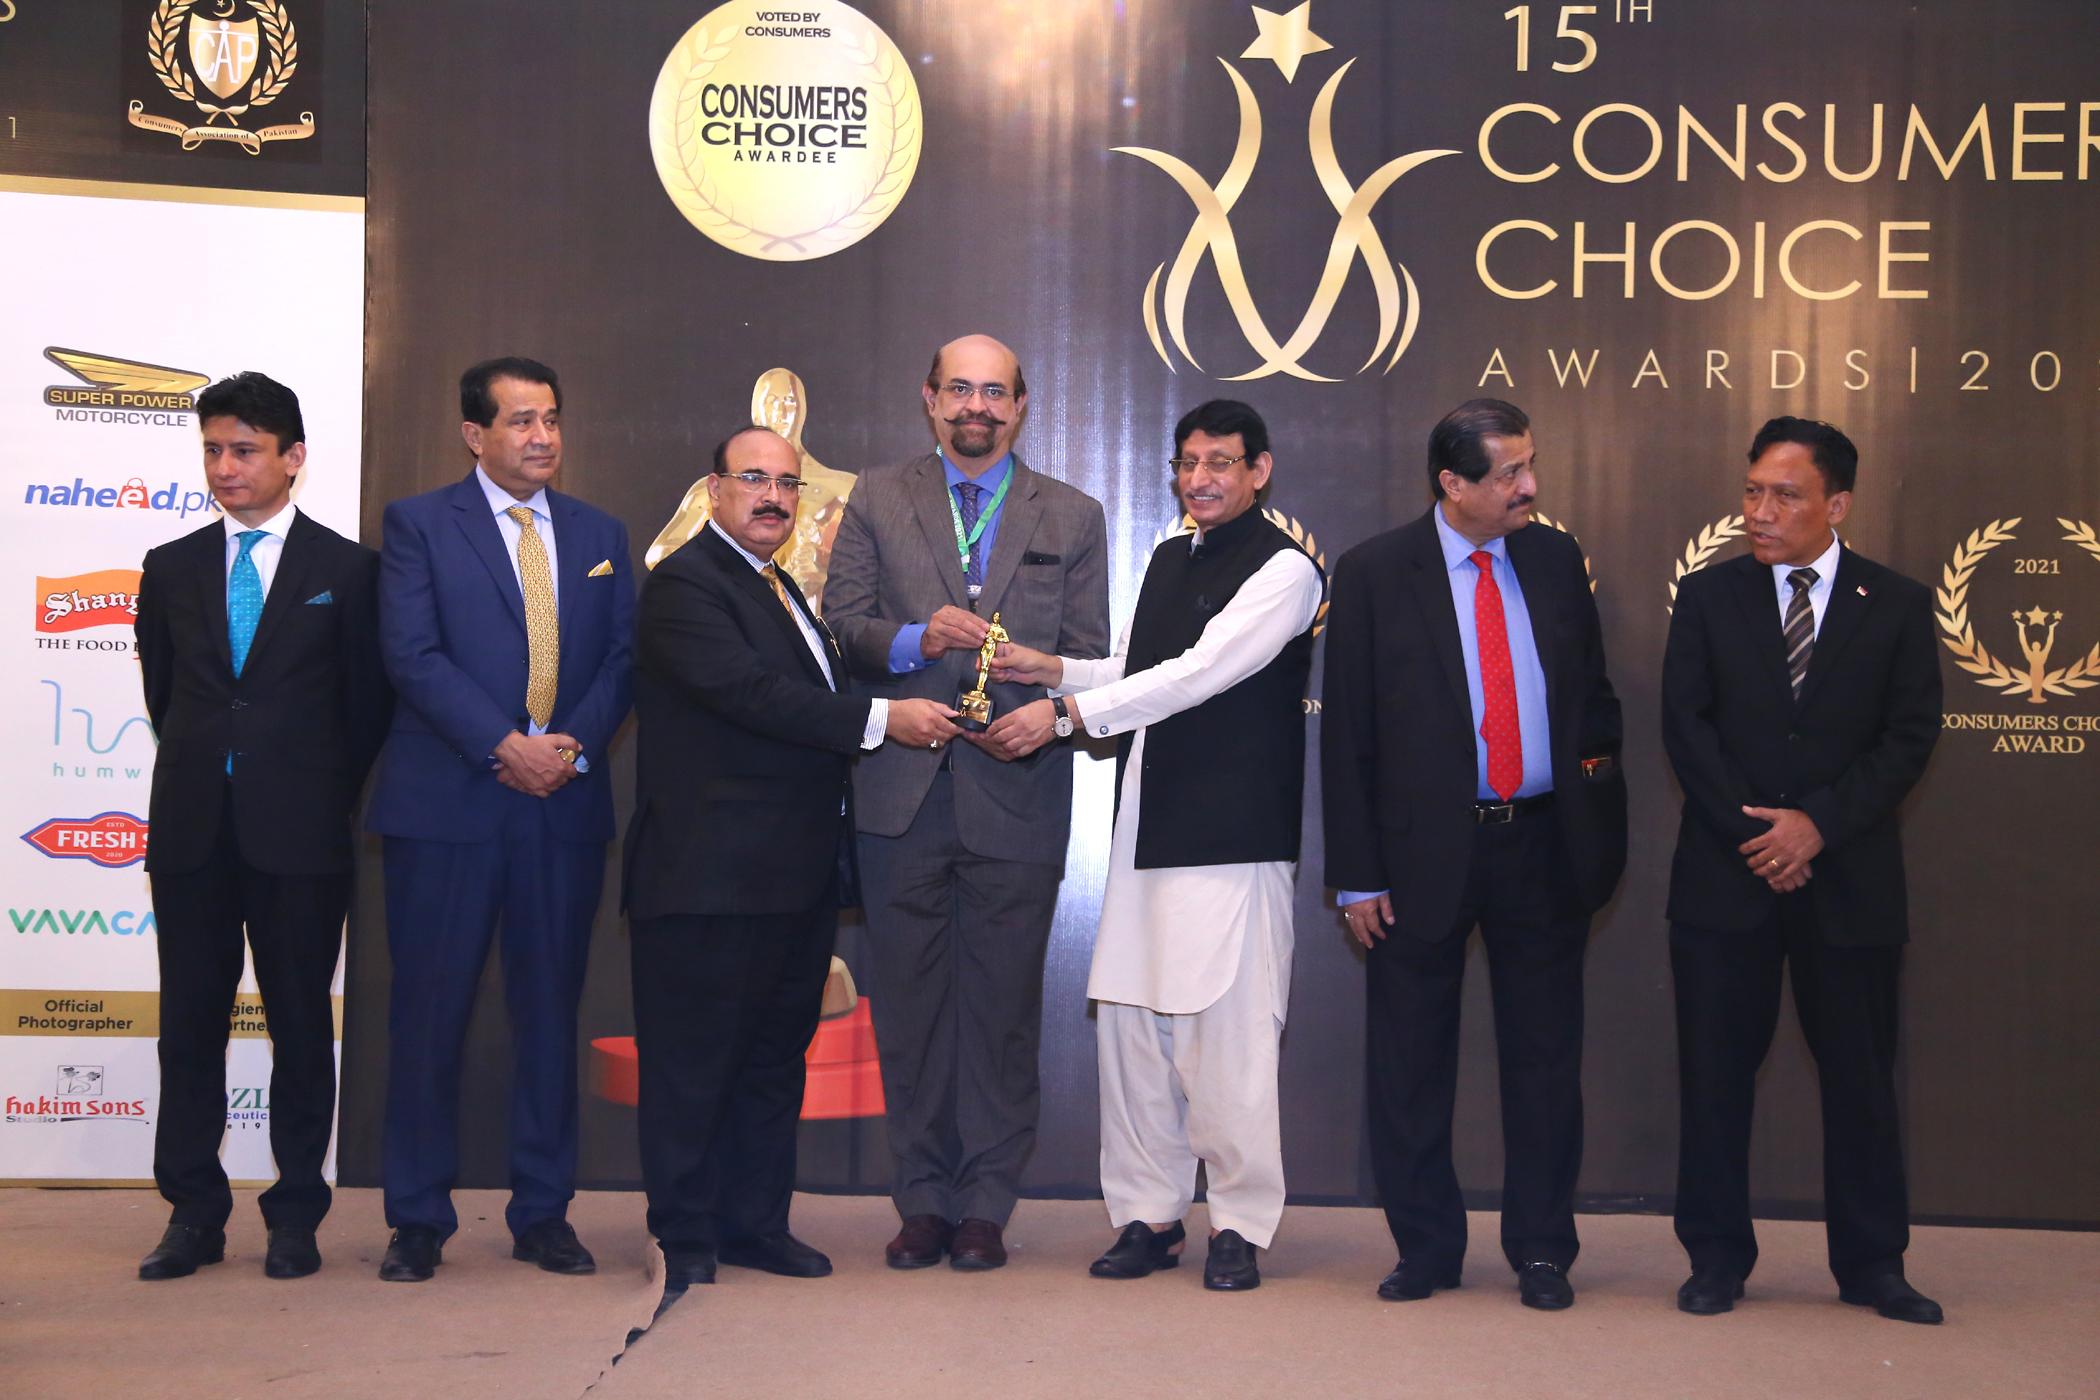 Consumers Choice Award 2021